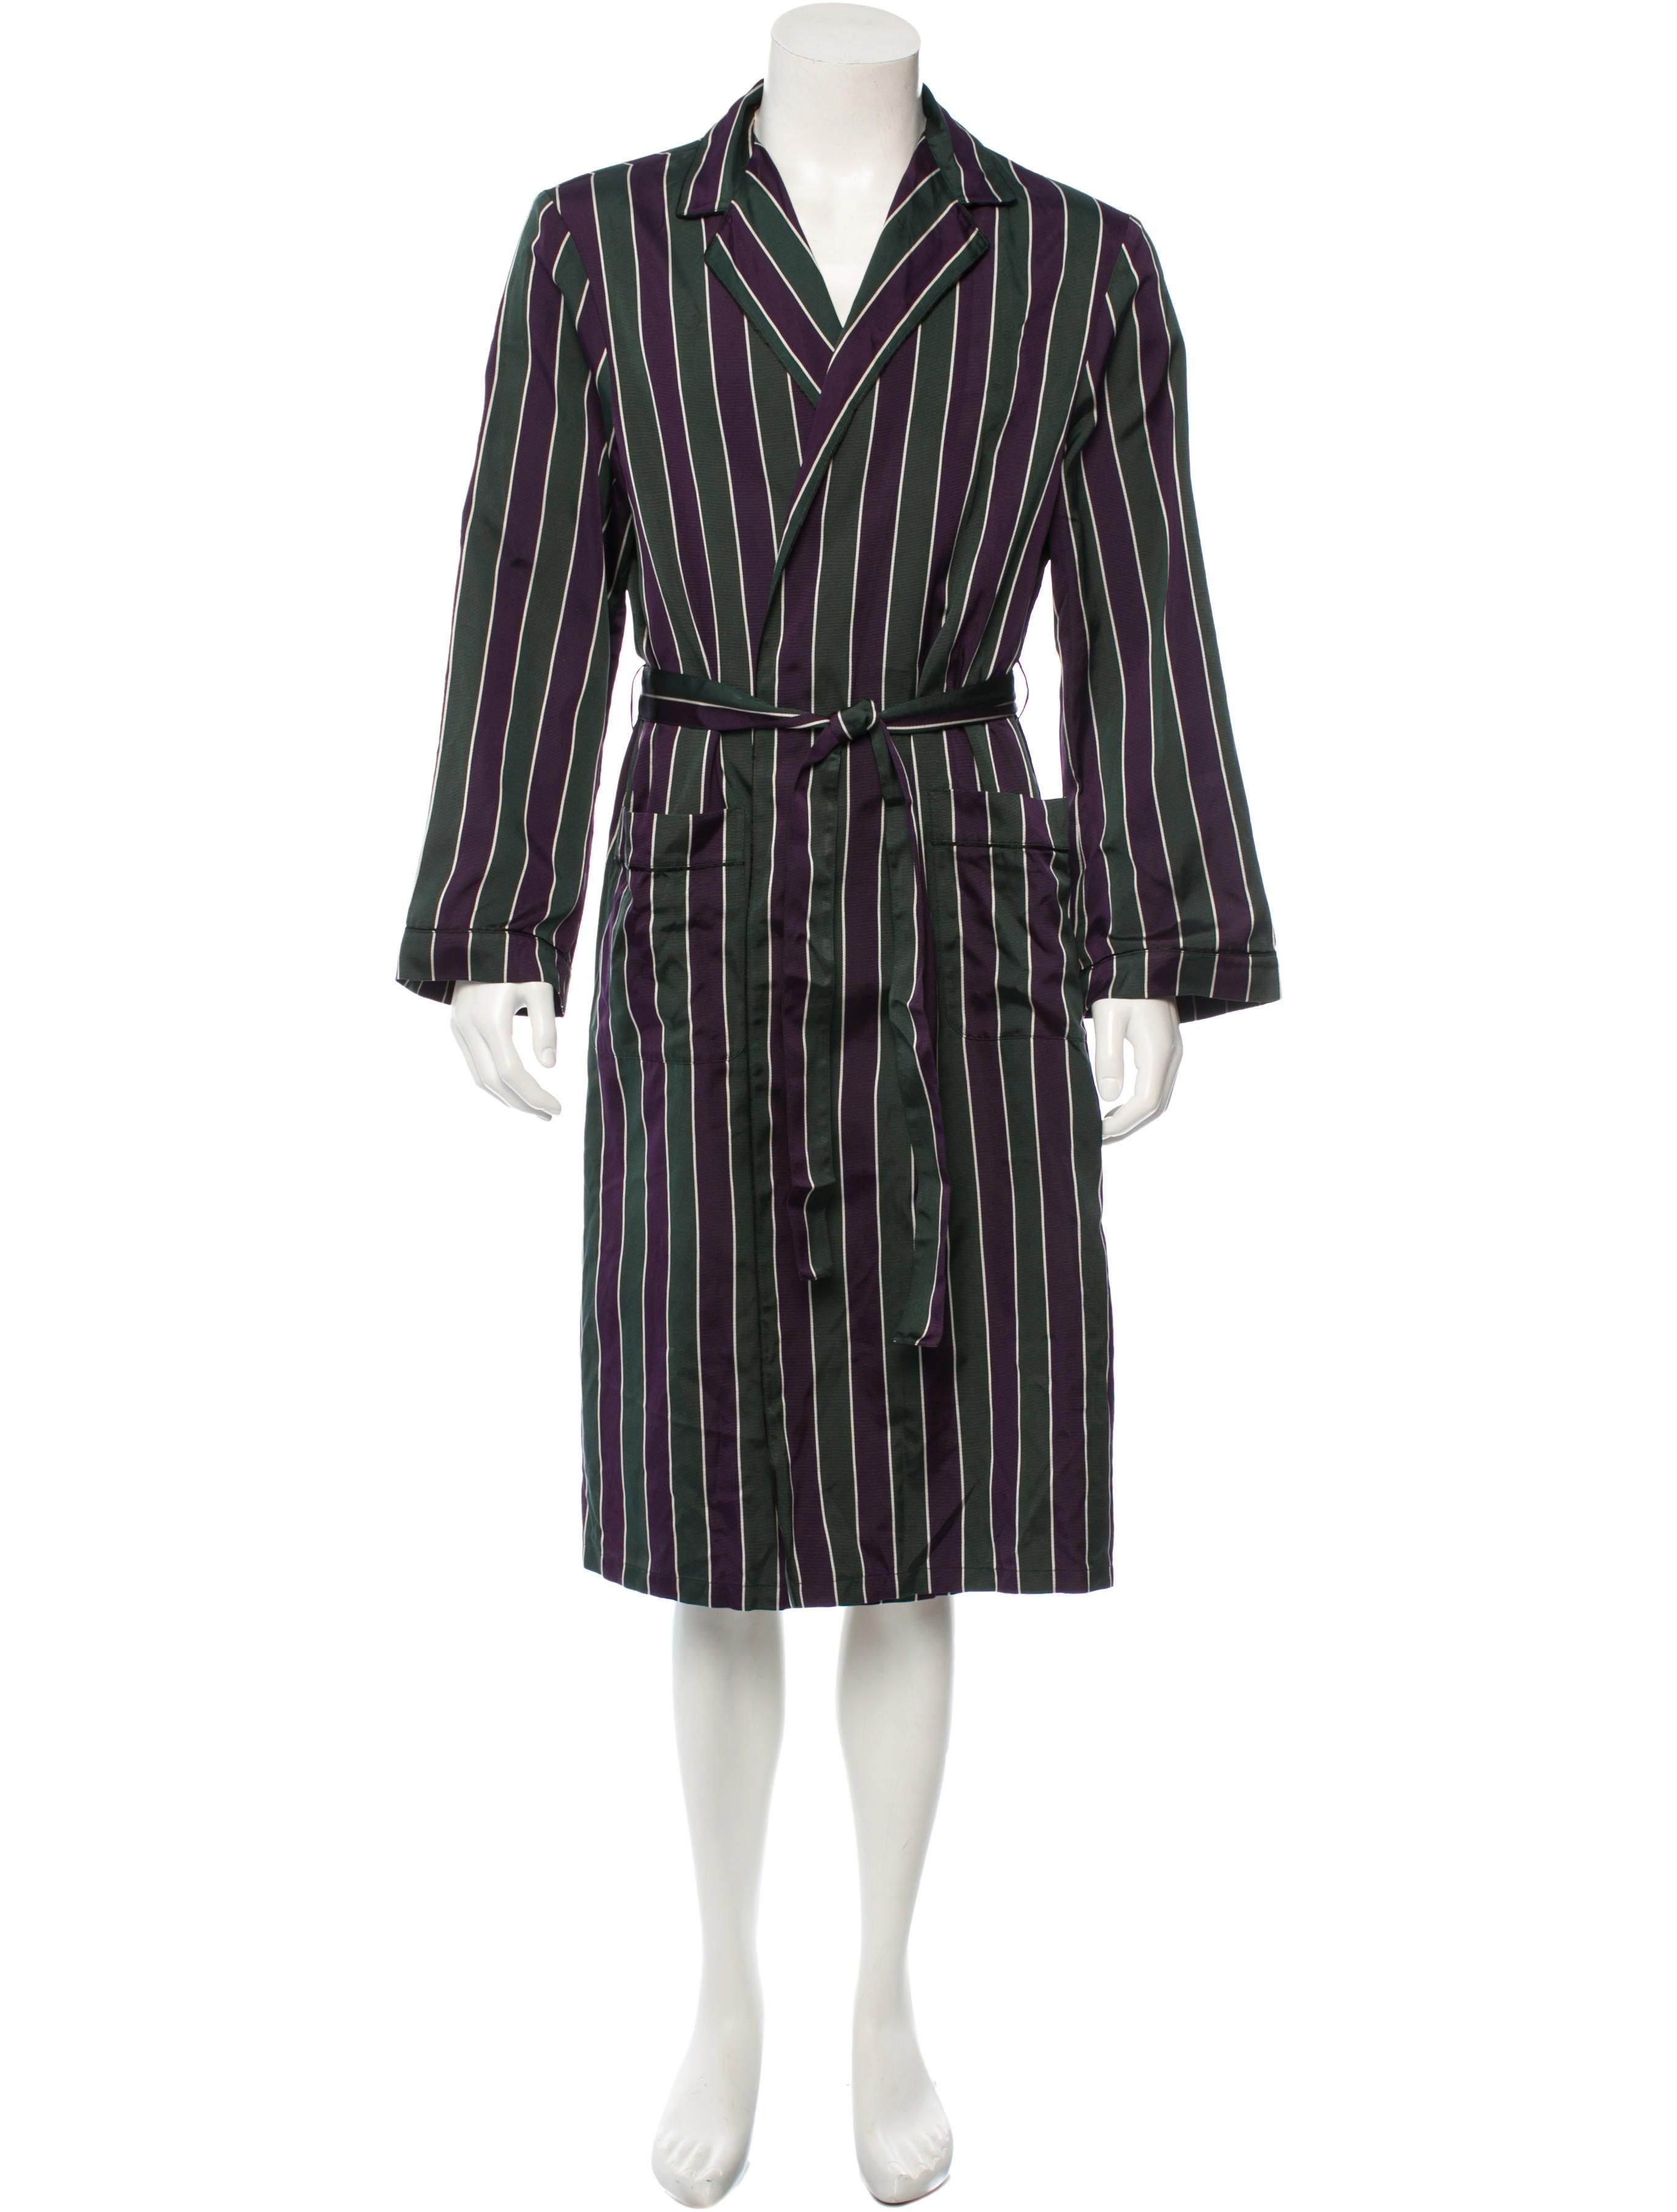 Prada Silk Robe - Mens Loungewear - PRA59354 | The RealReal